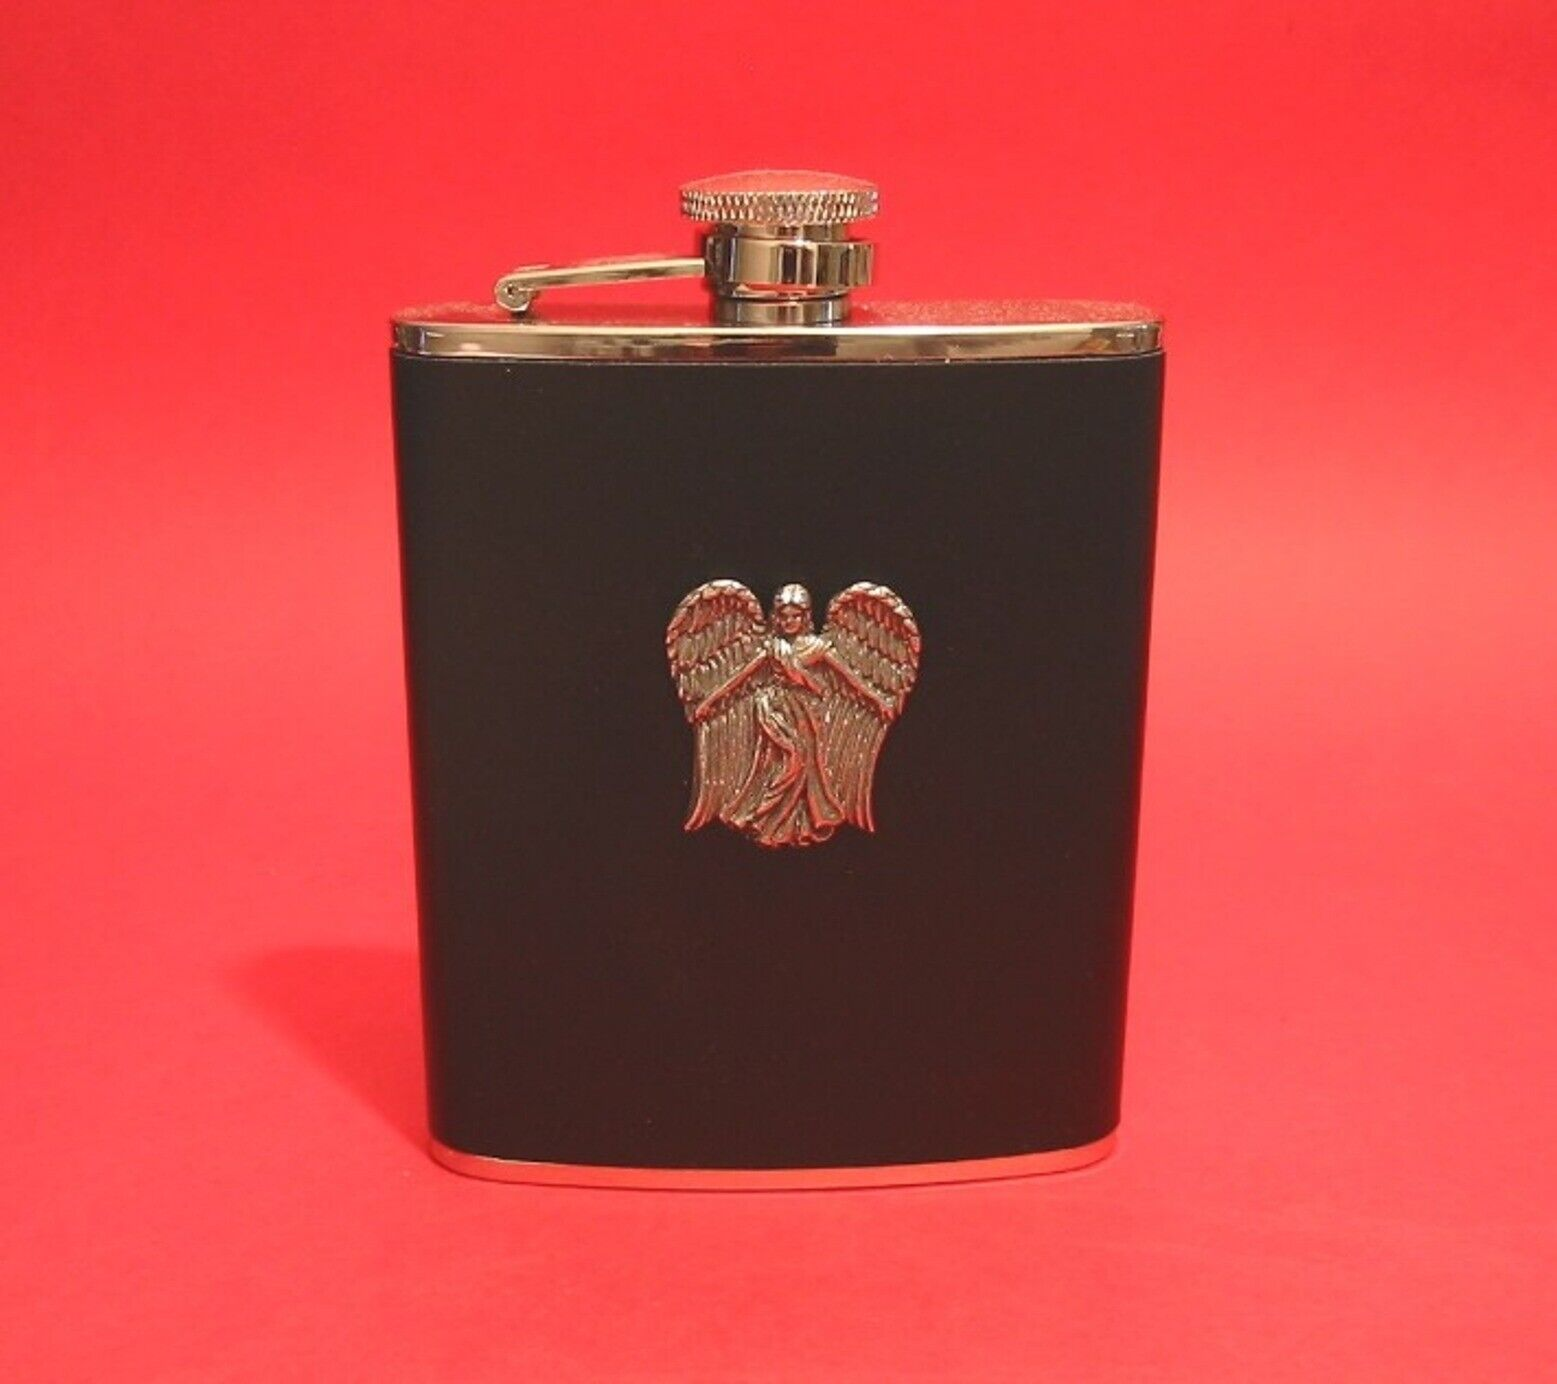 Guardian Angel Black Leather 6oz Hip Flask Good Luck Well Wishing Christmas Gift